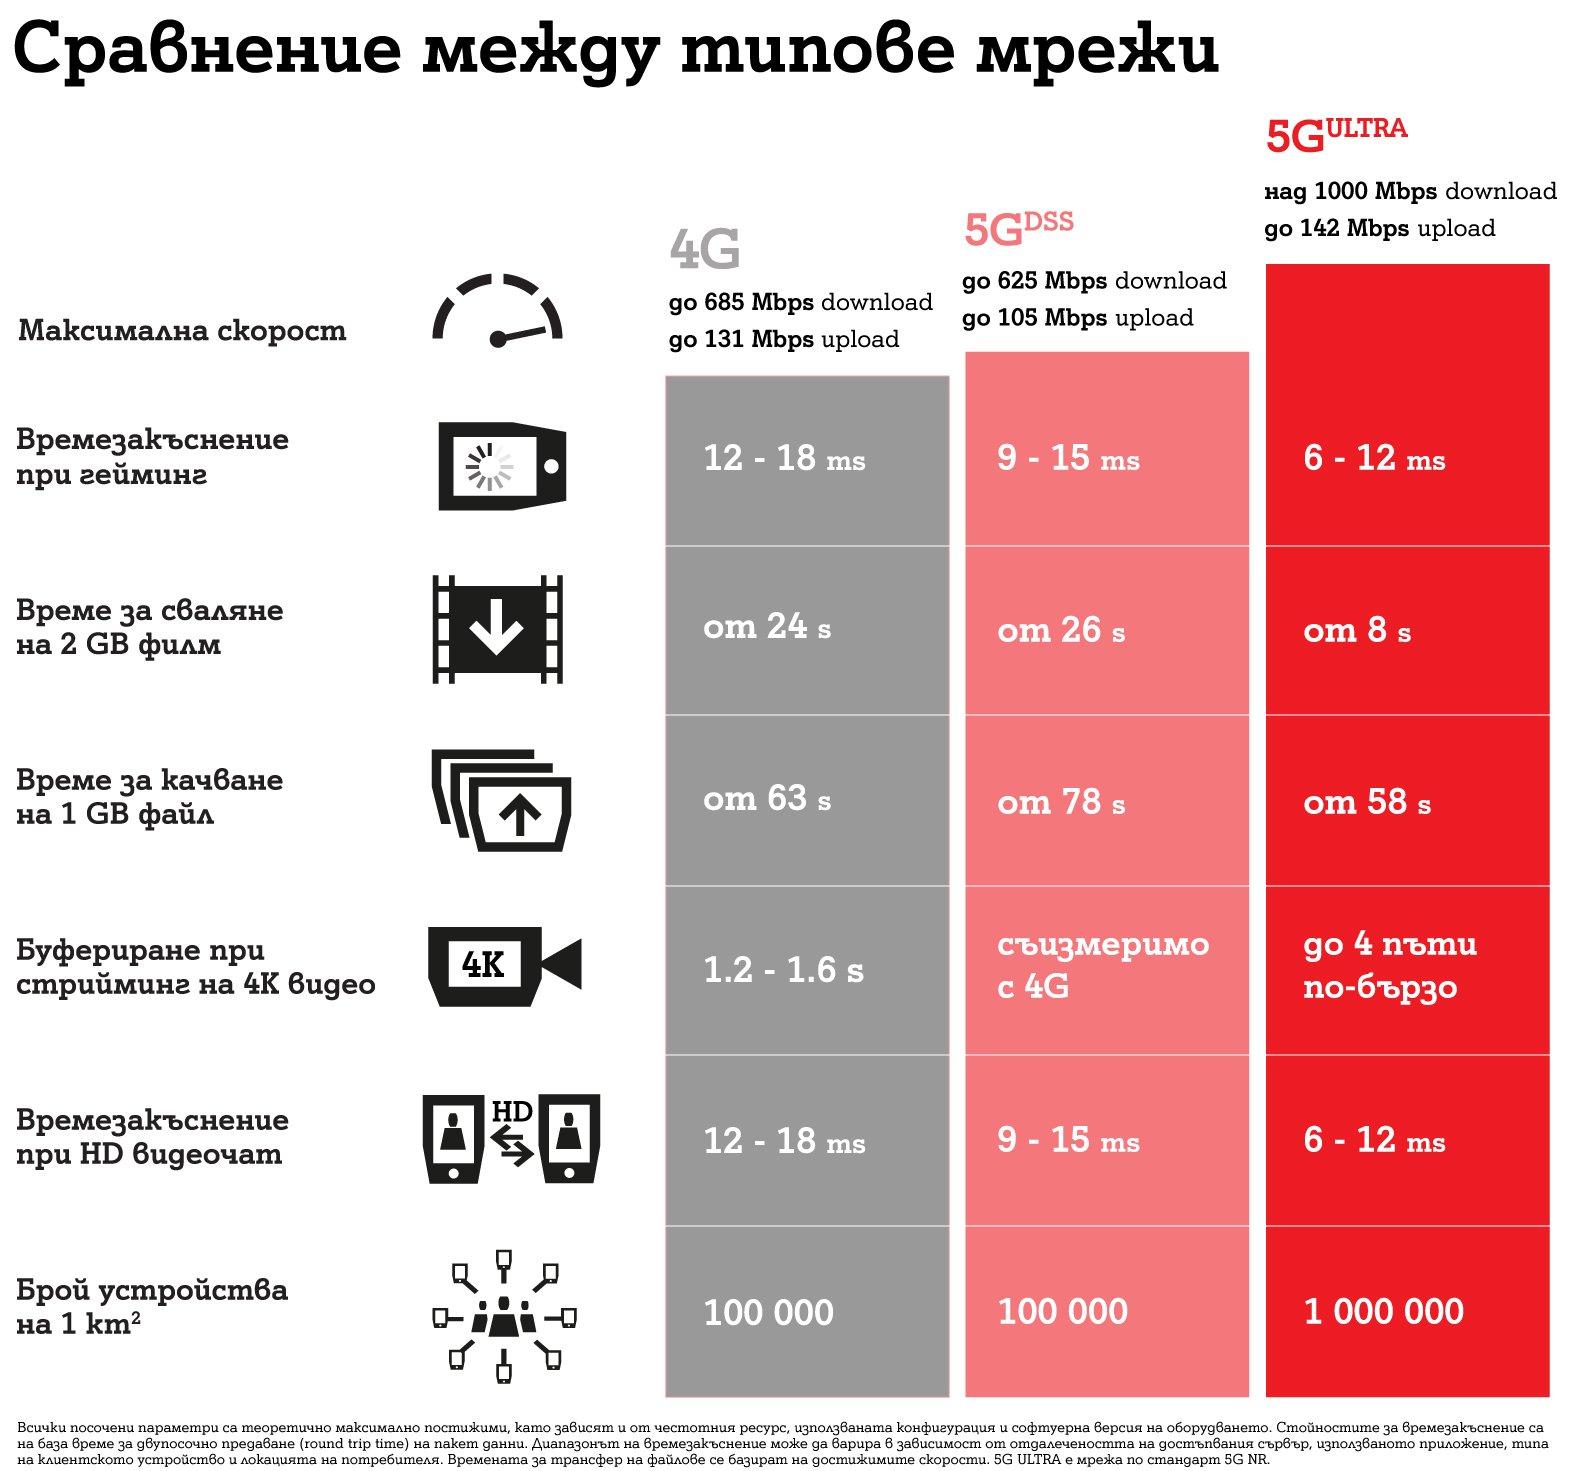 5G-infographic